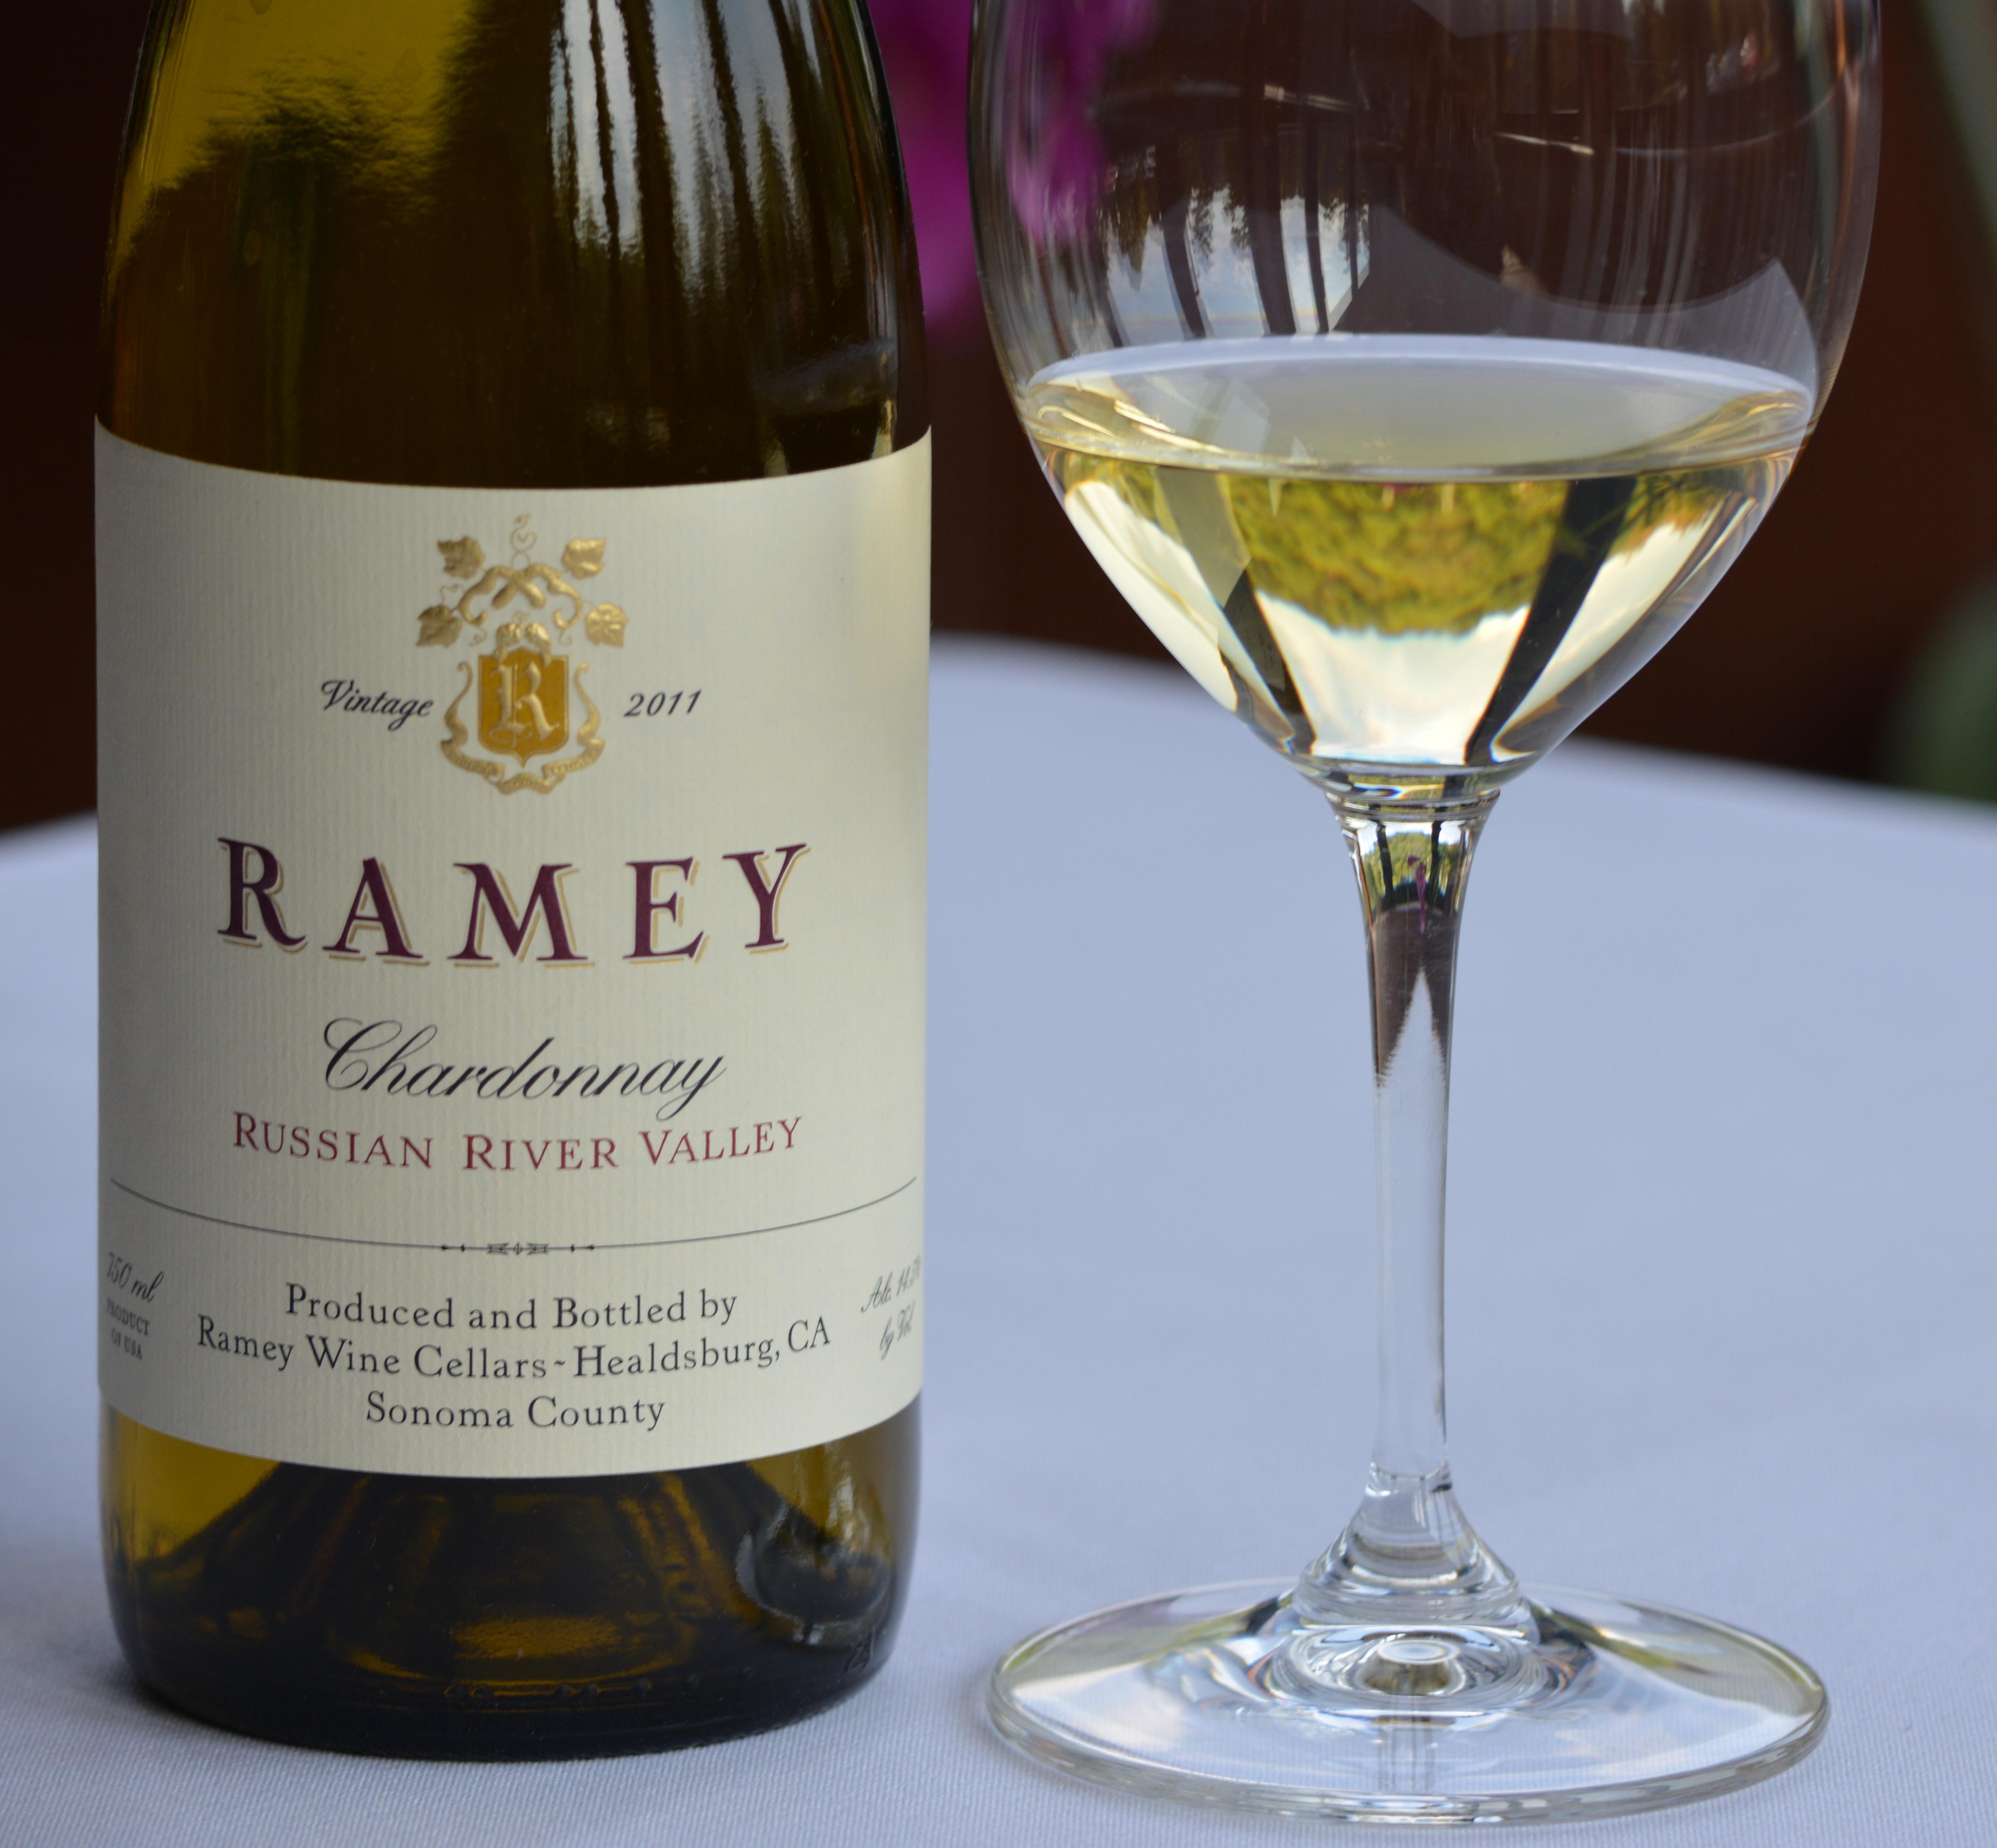 Ramey Chardonnay